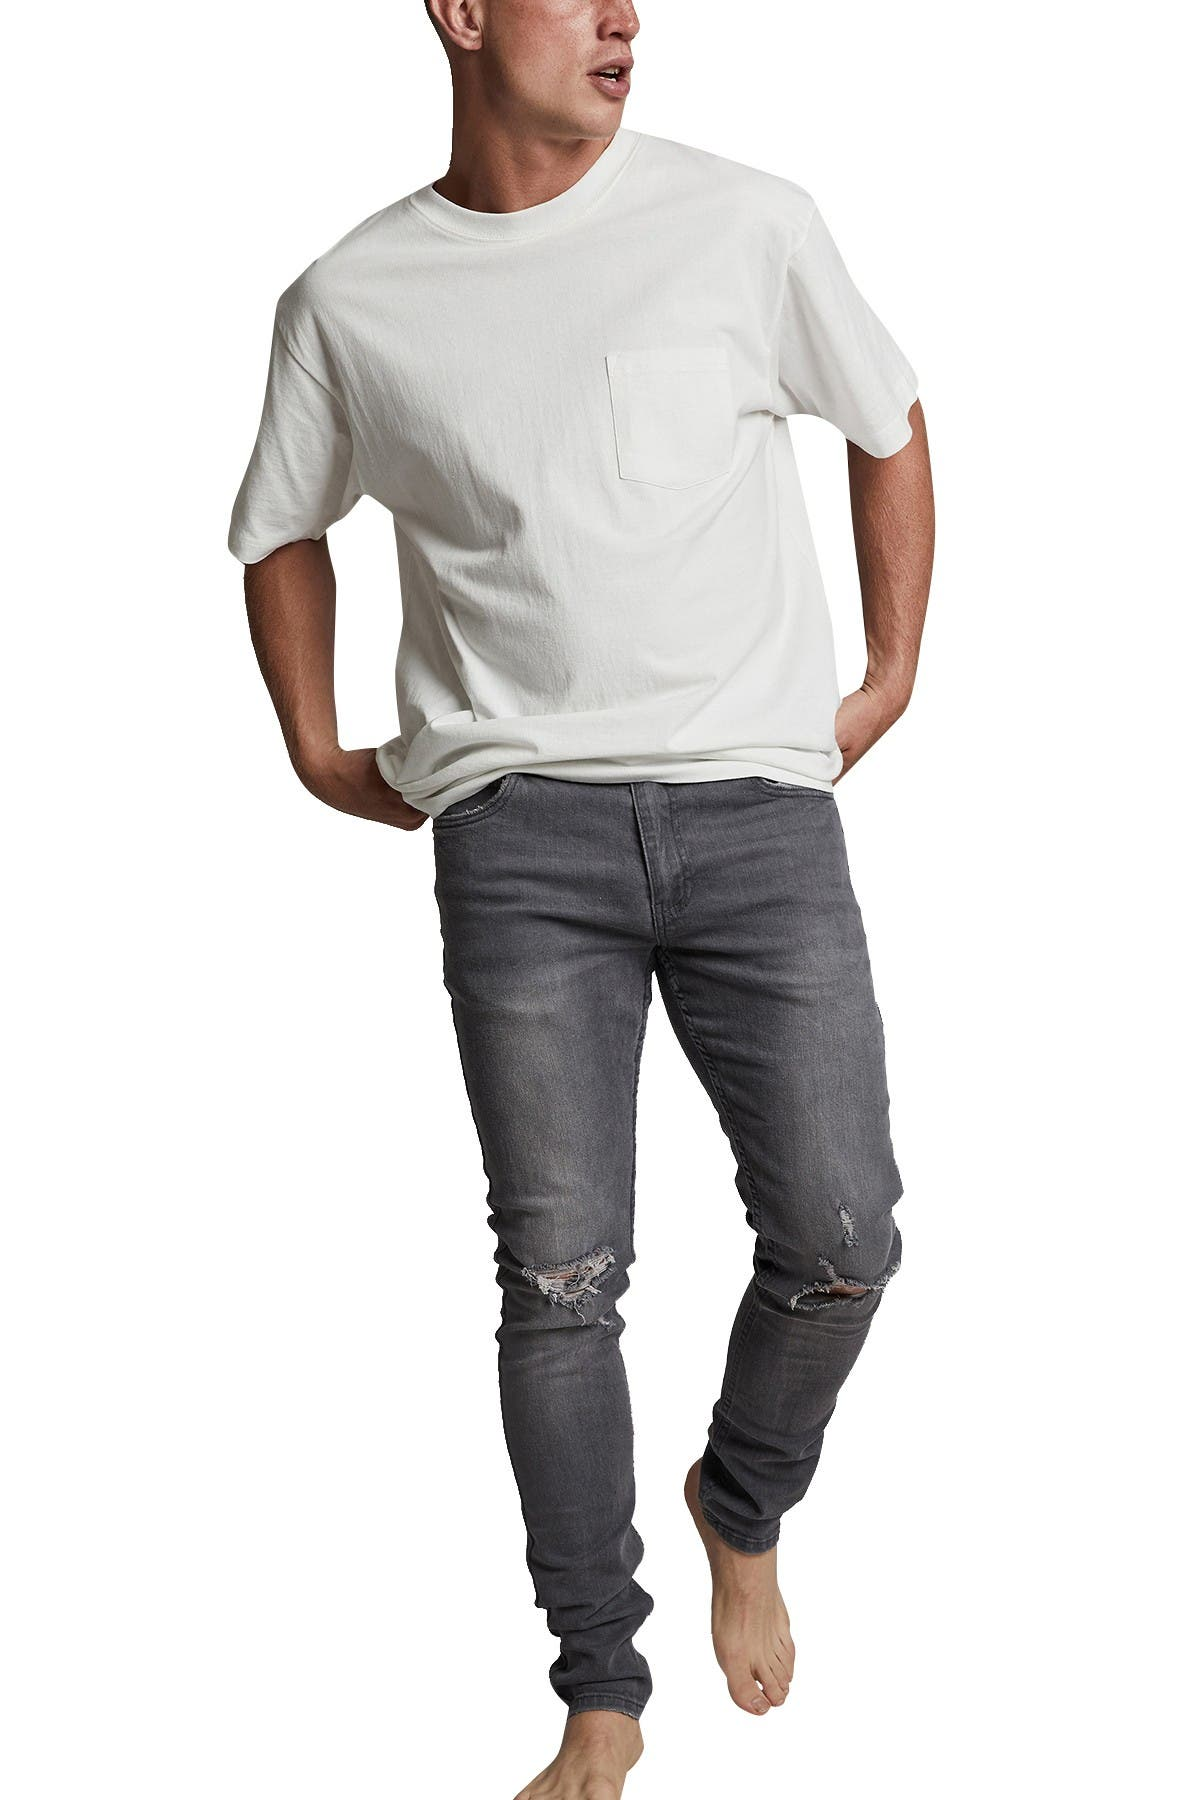 Cotton On Super Skinny Jeans at Nordstrom Rack